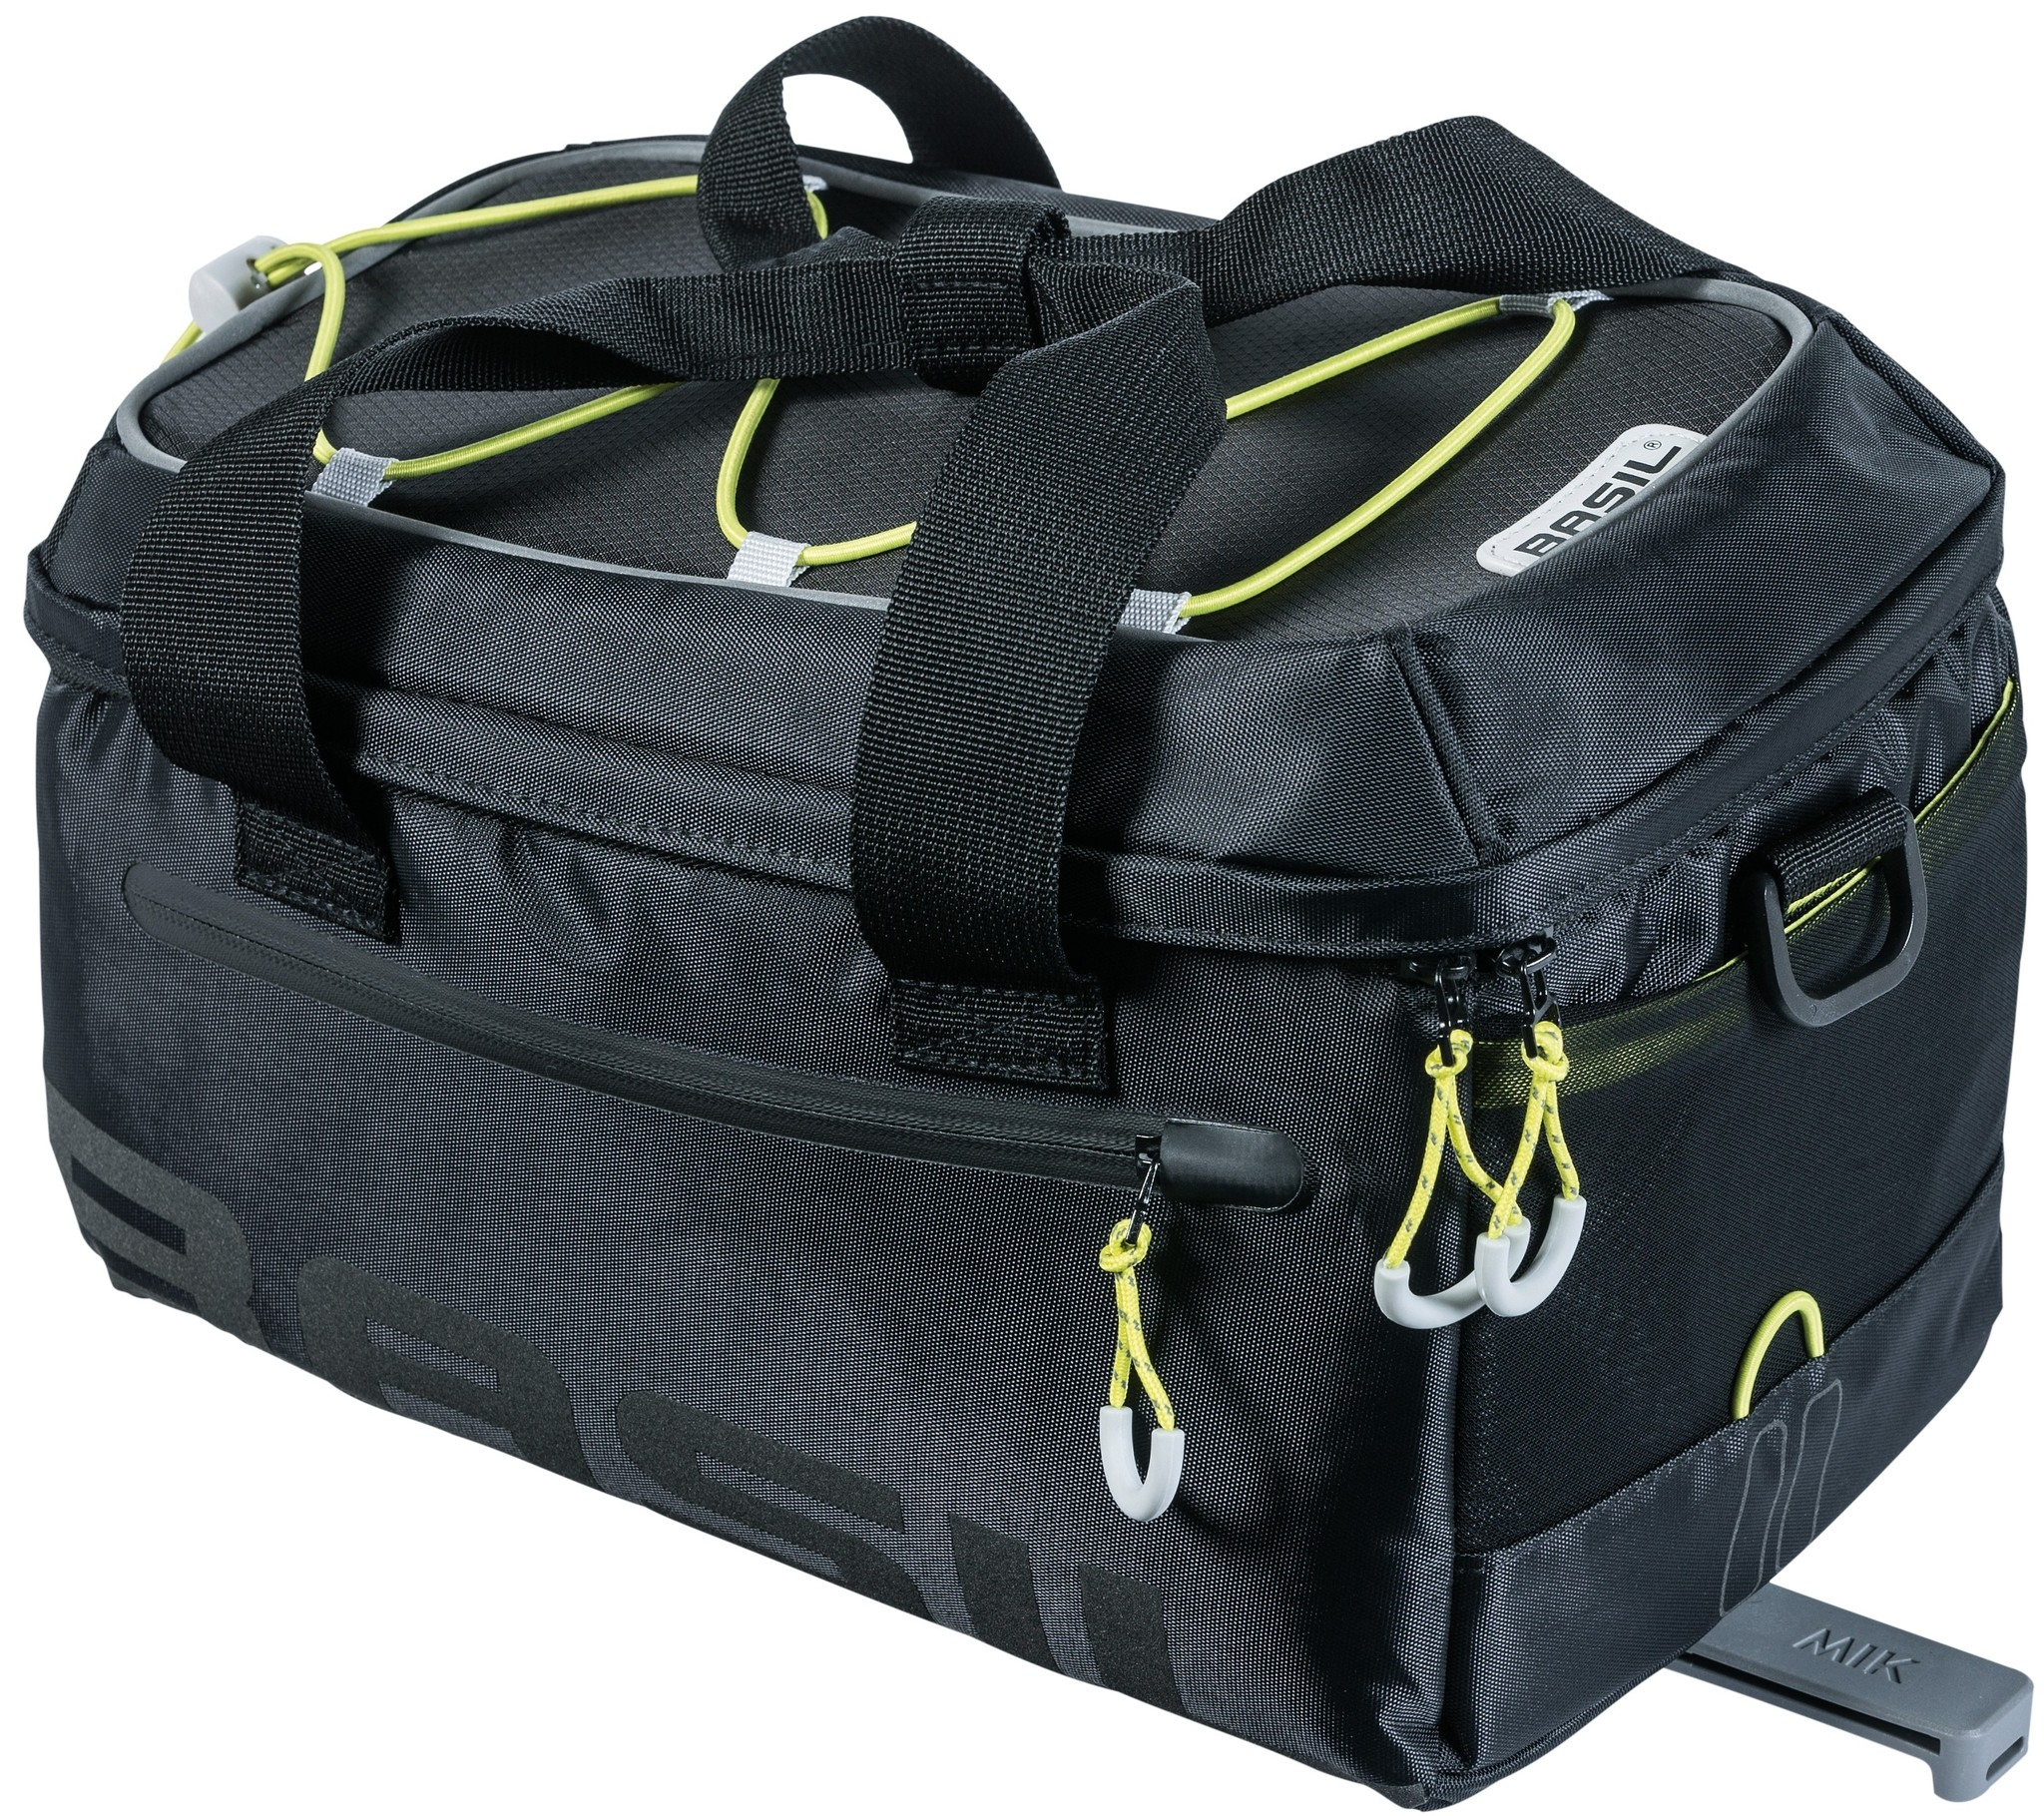 Basil Bagagedragertas / schoudertas Basil Miles Trunkbag MIK 7 liter - zwart/lime